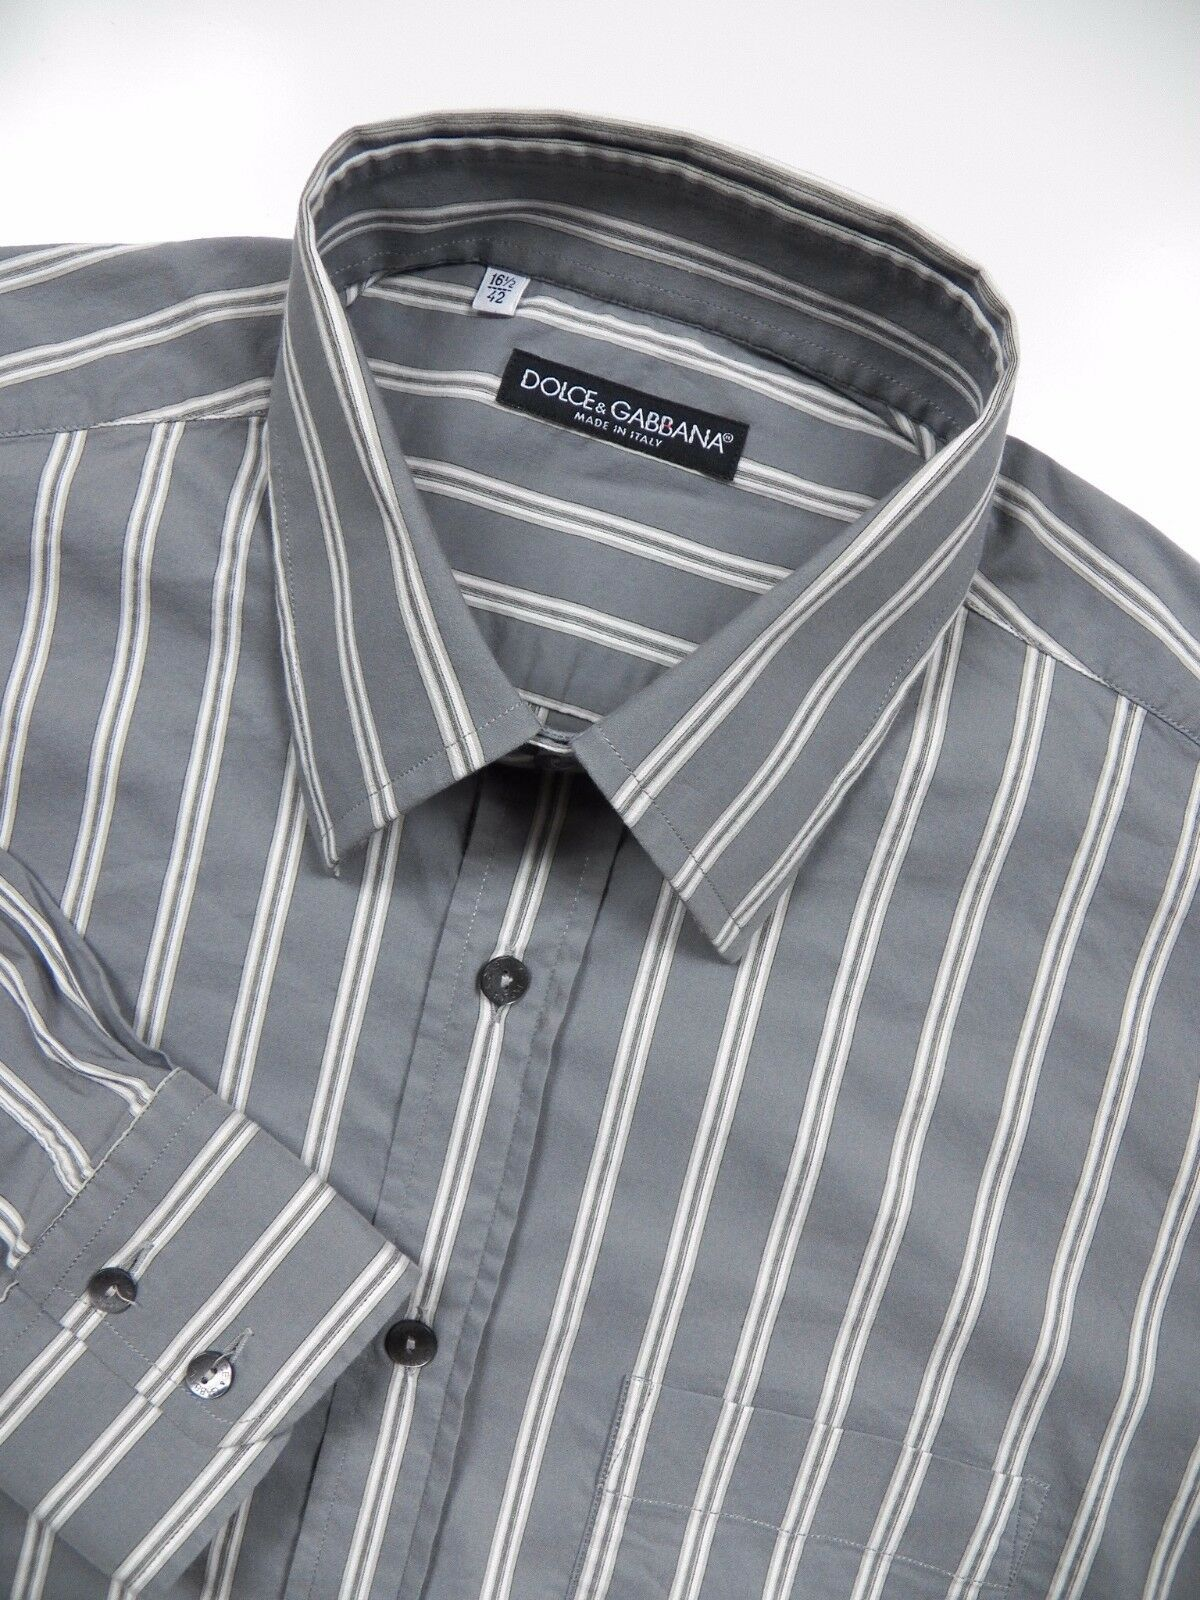 DOLCE & GABBANA  Herren 16.5 LARGE 34 DRESS SHIRT grau Weiß STRIPE STRETCH ITALY